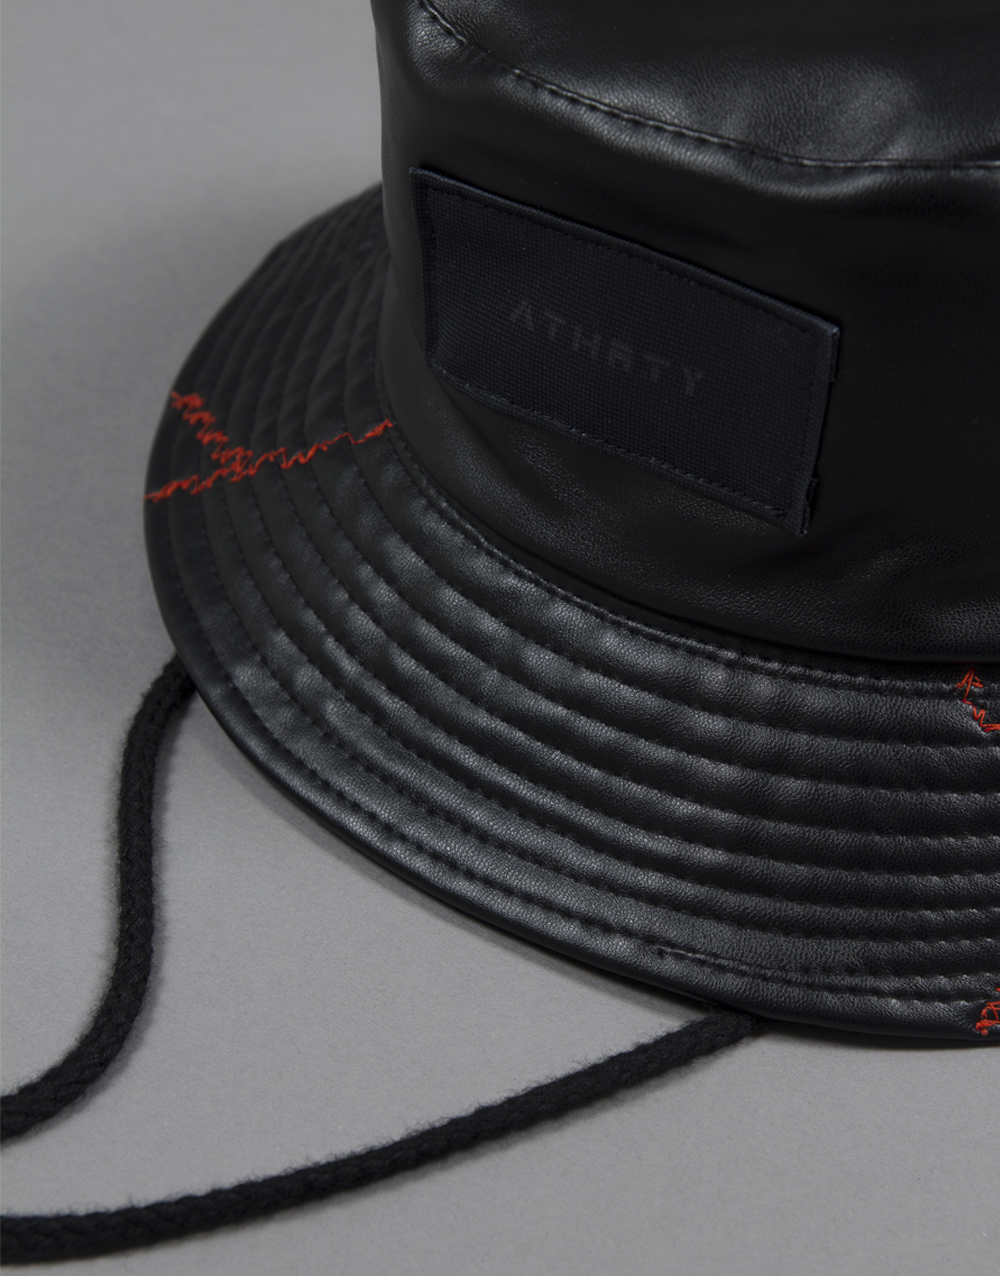 ATHRTY_kilauea_bucket_hat